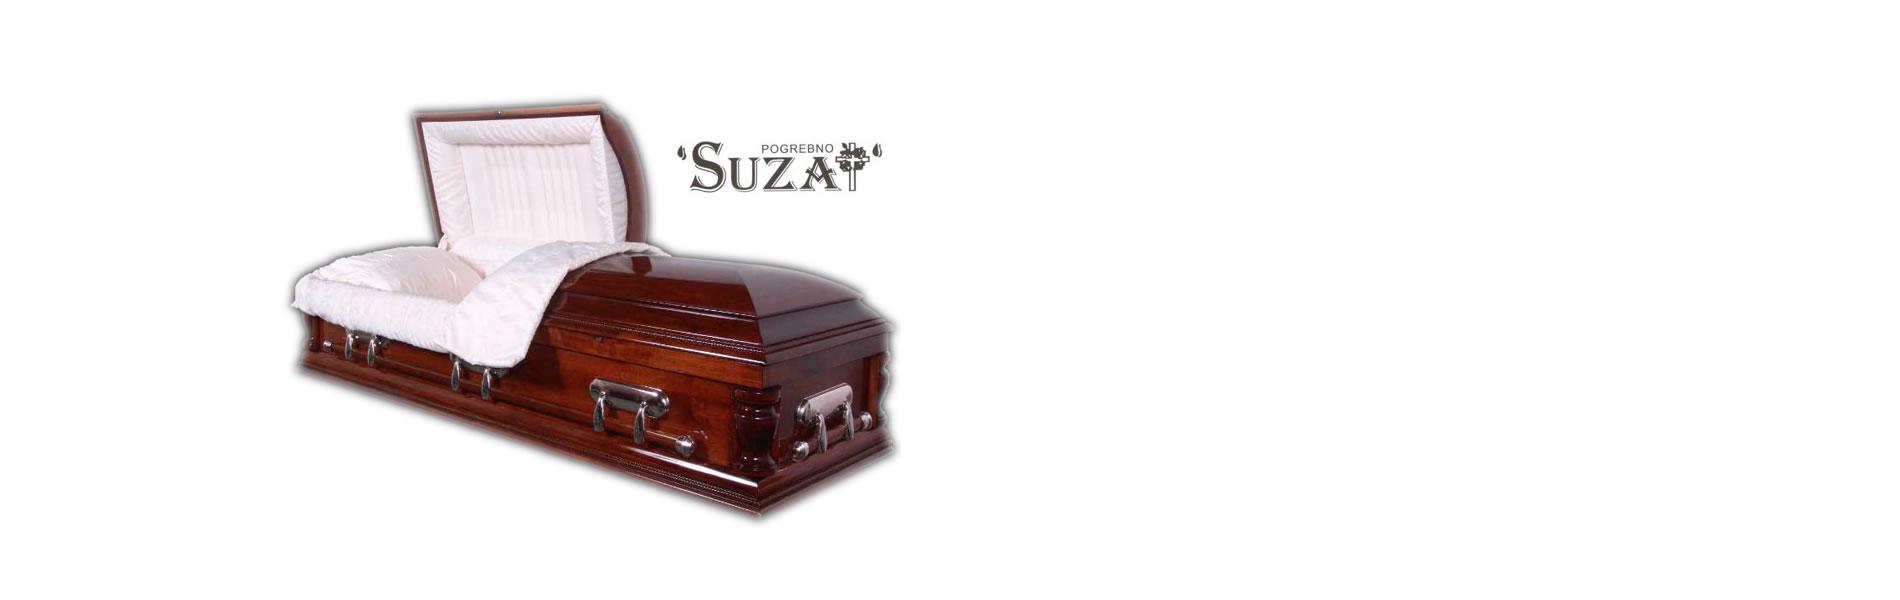 Pogrebno Suza Pančevo cover